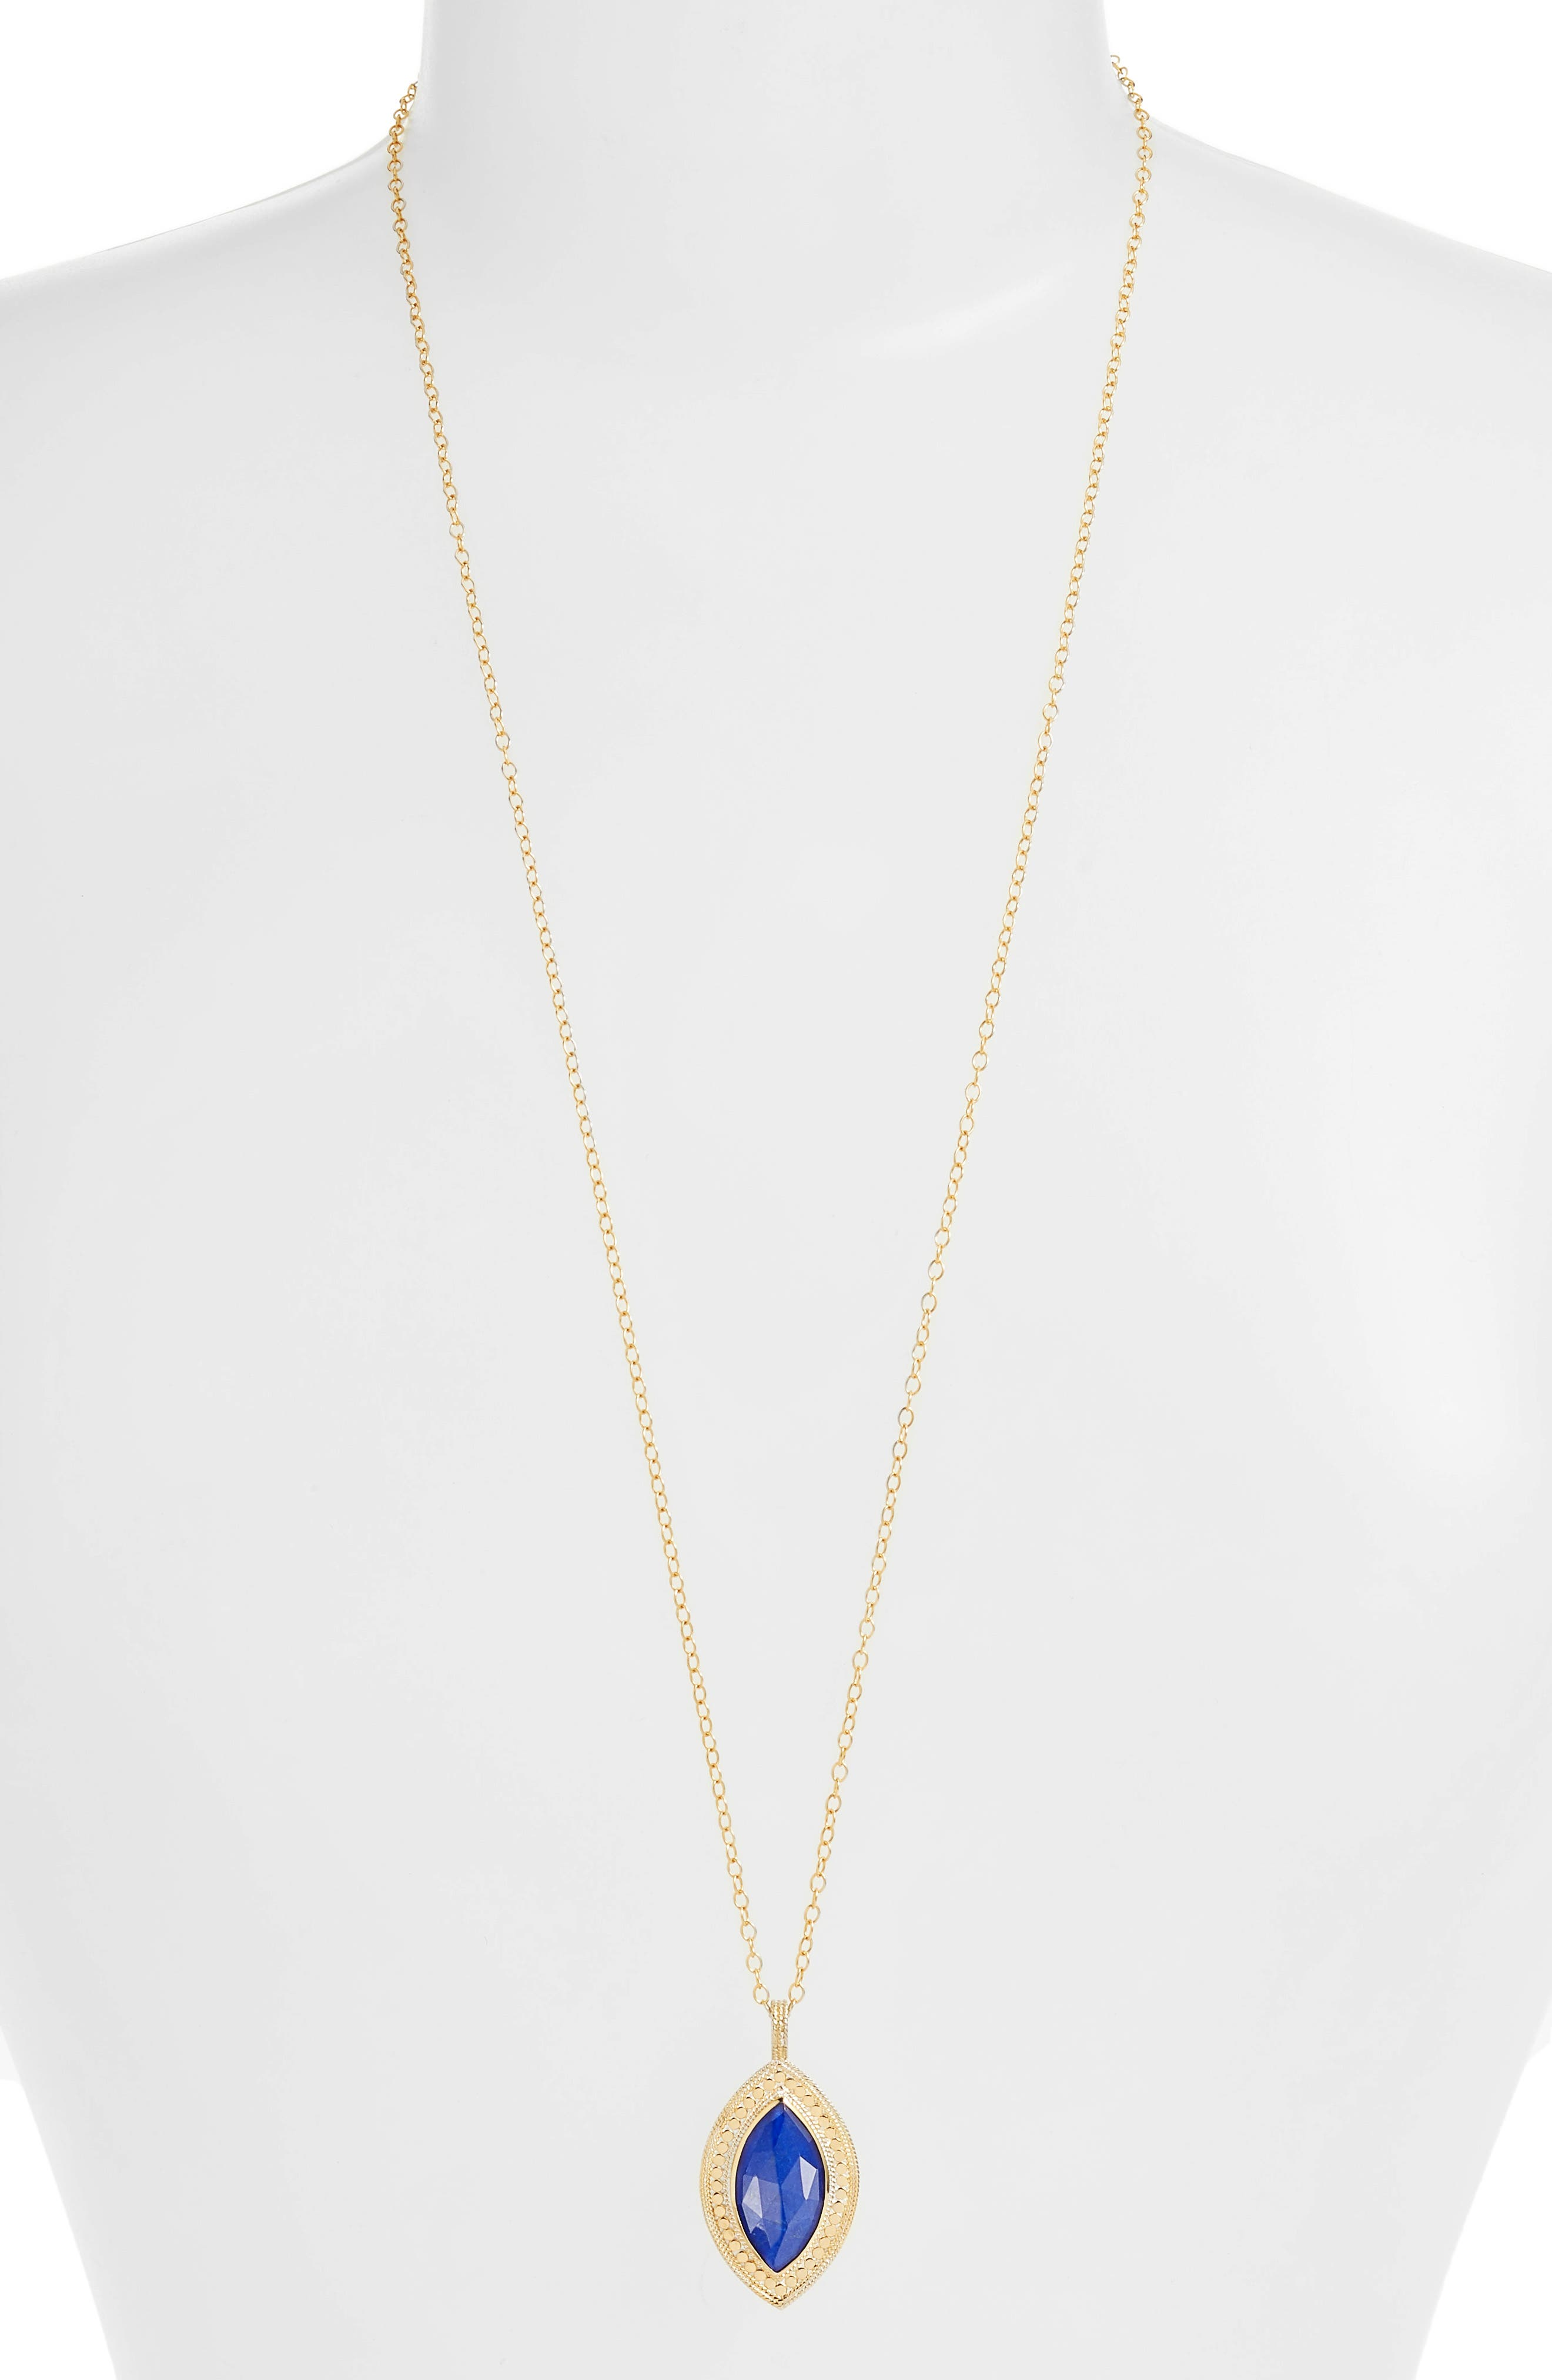 Double Sided Lapis Pendant Necklace